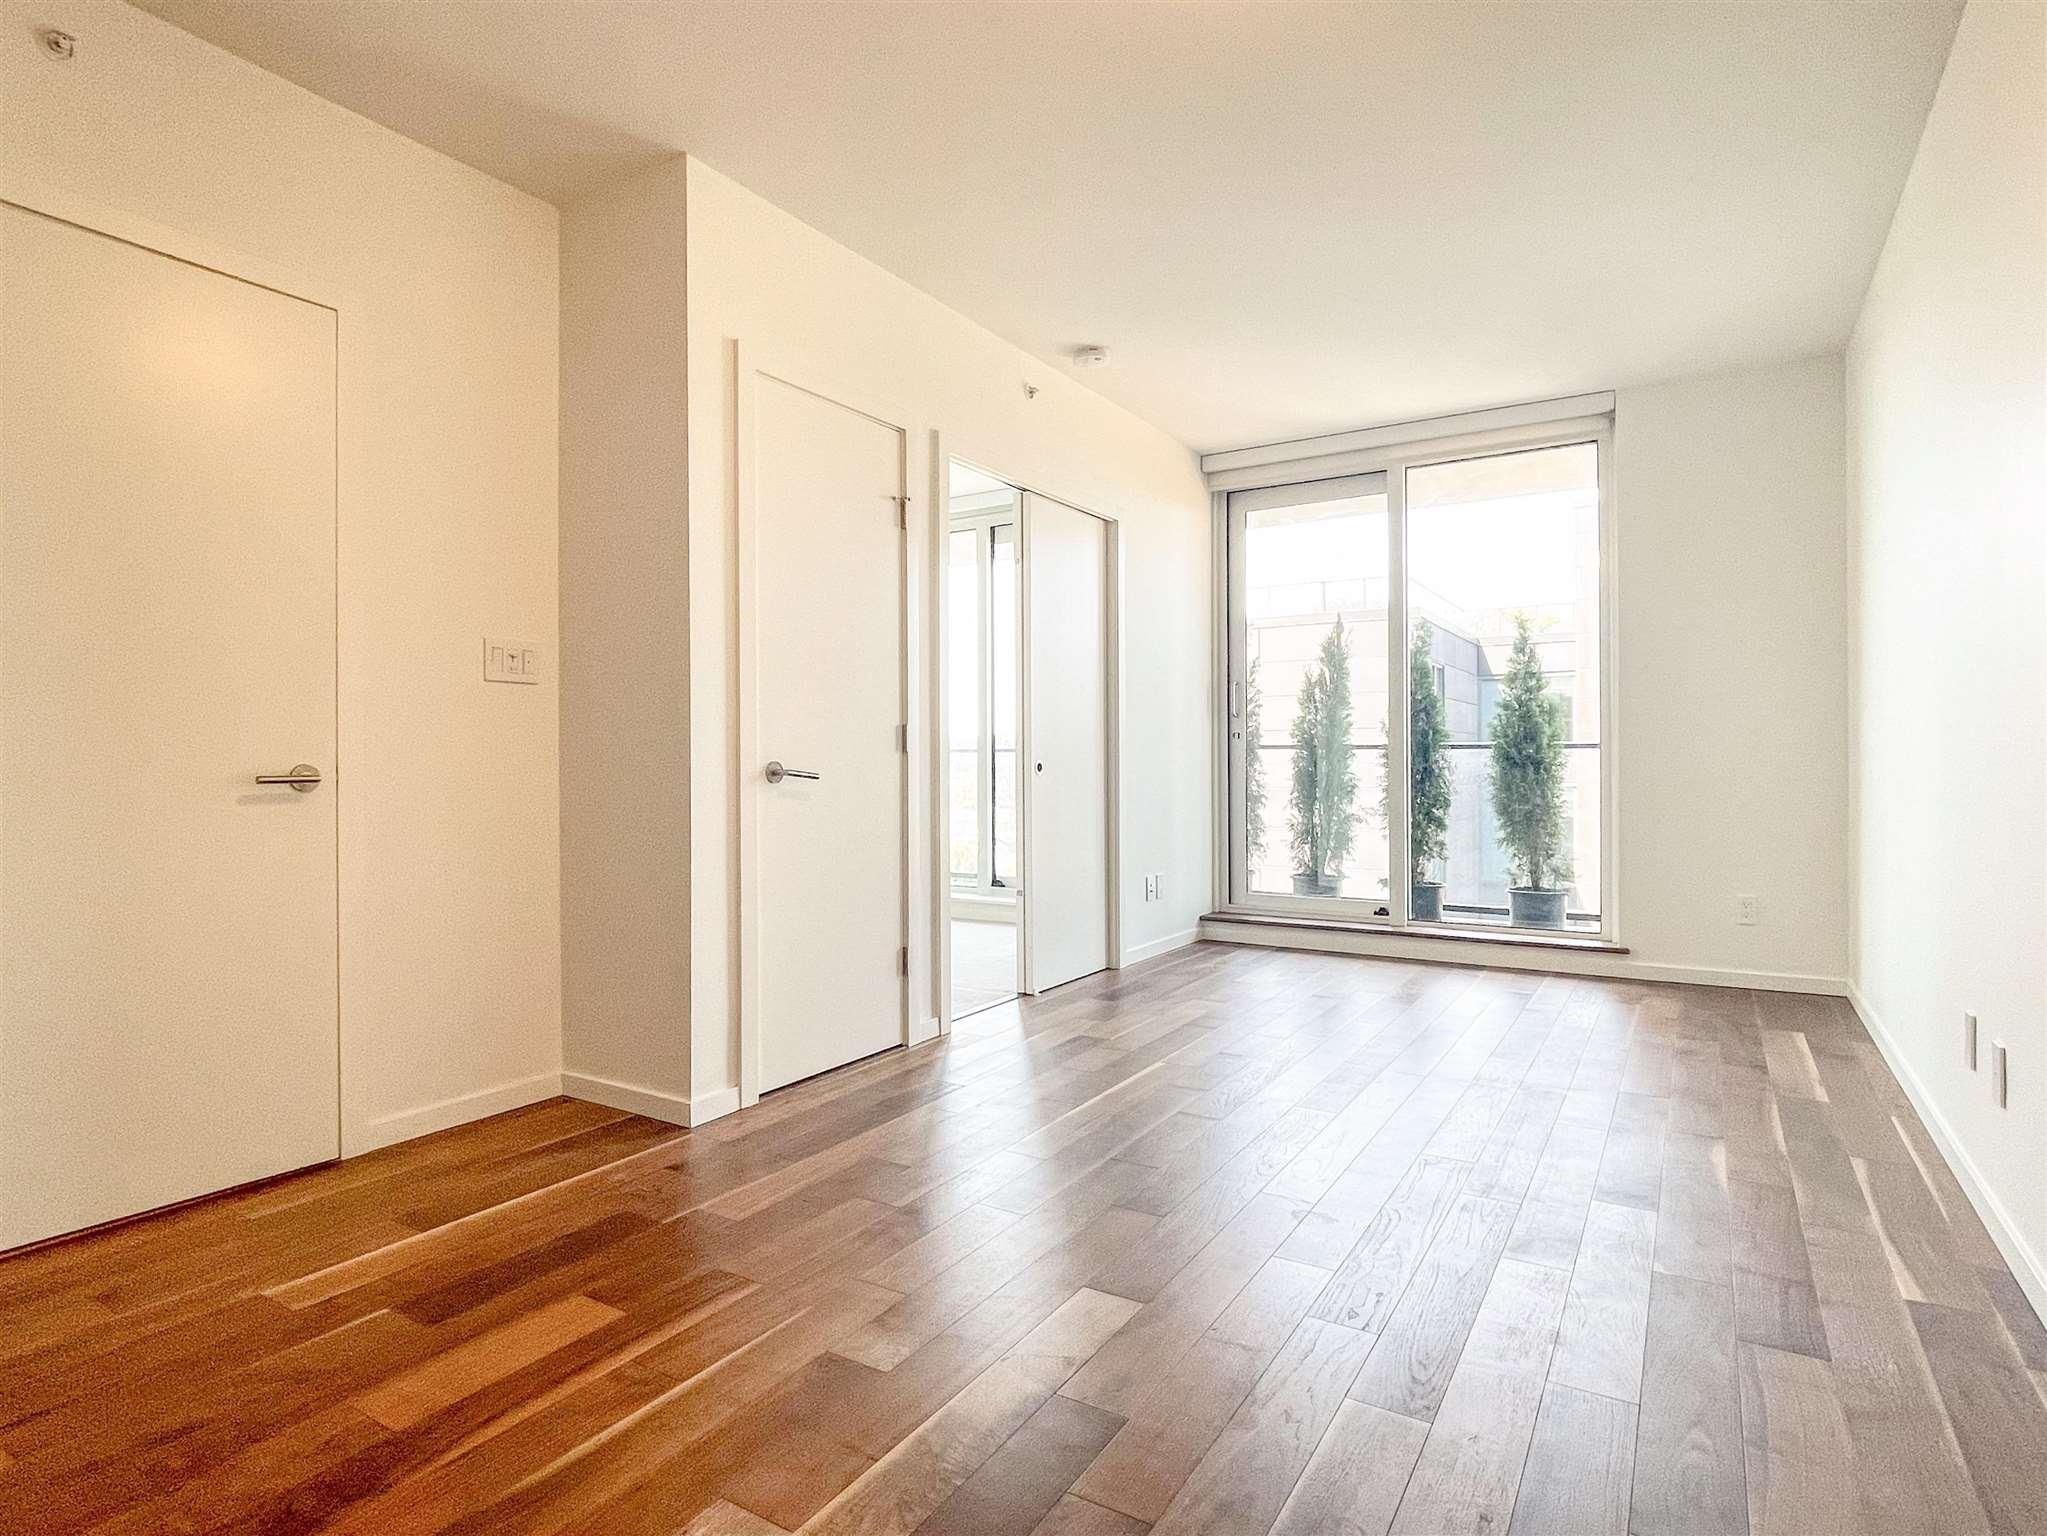 903 8588 CORNISH STREET - S.W. Marine Apartment/Condo for sale, 1 Bedroom (R2600764)